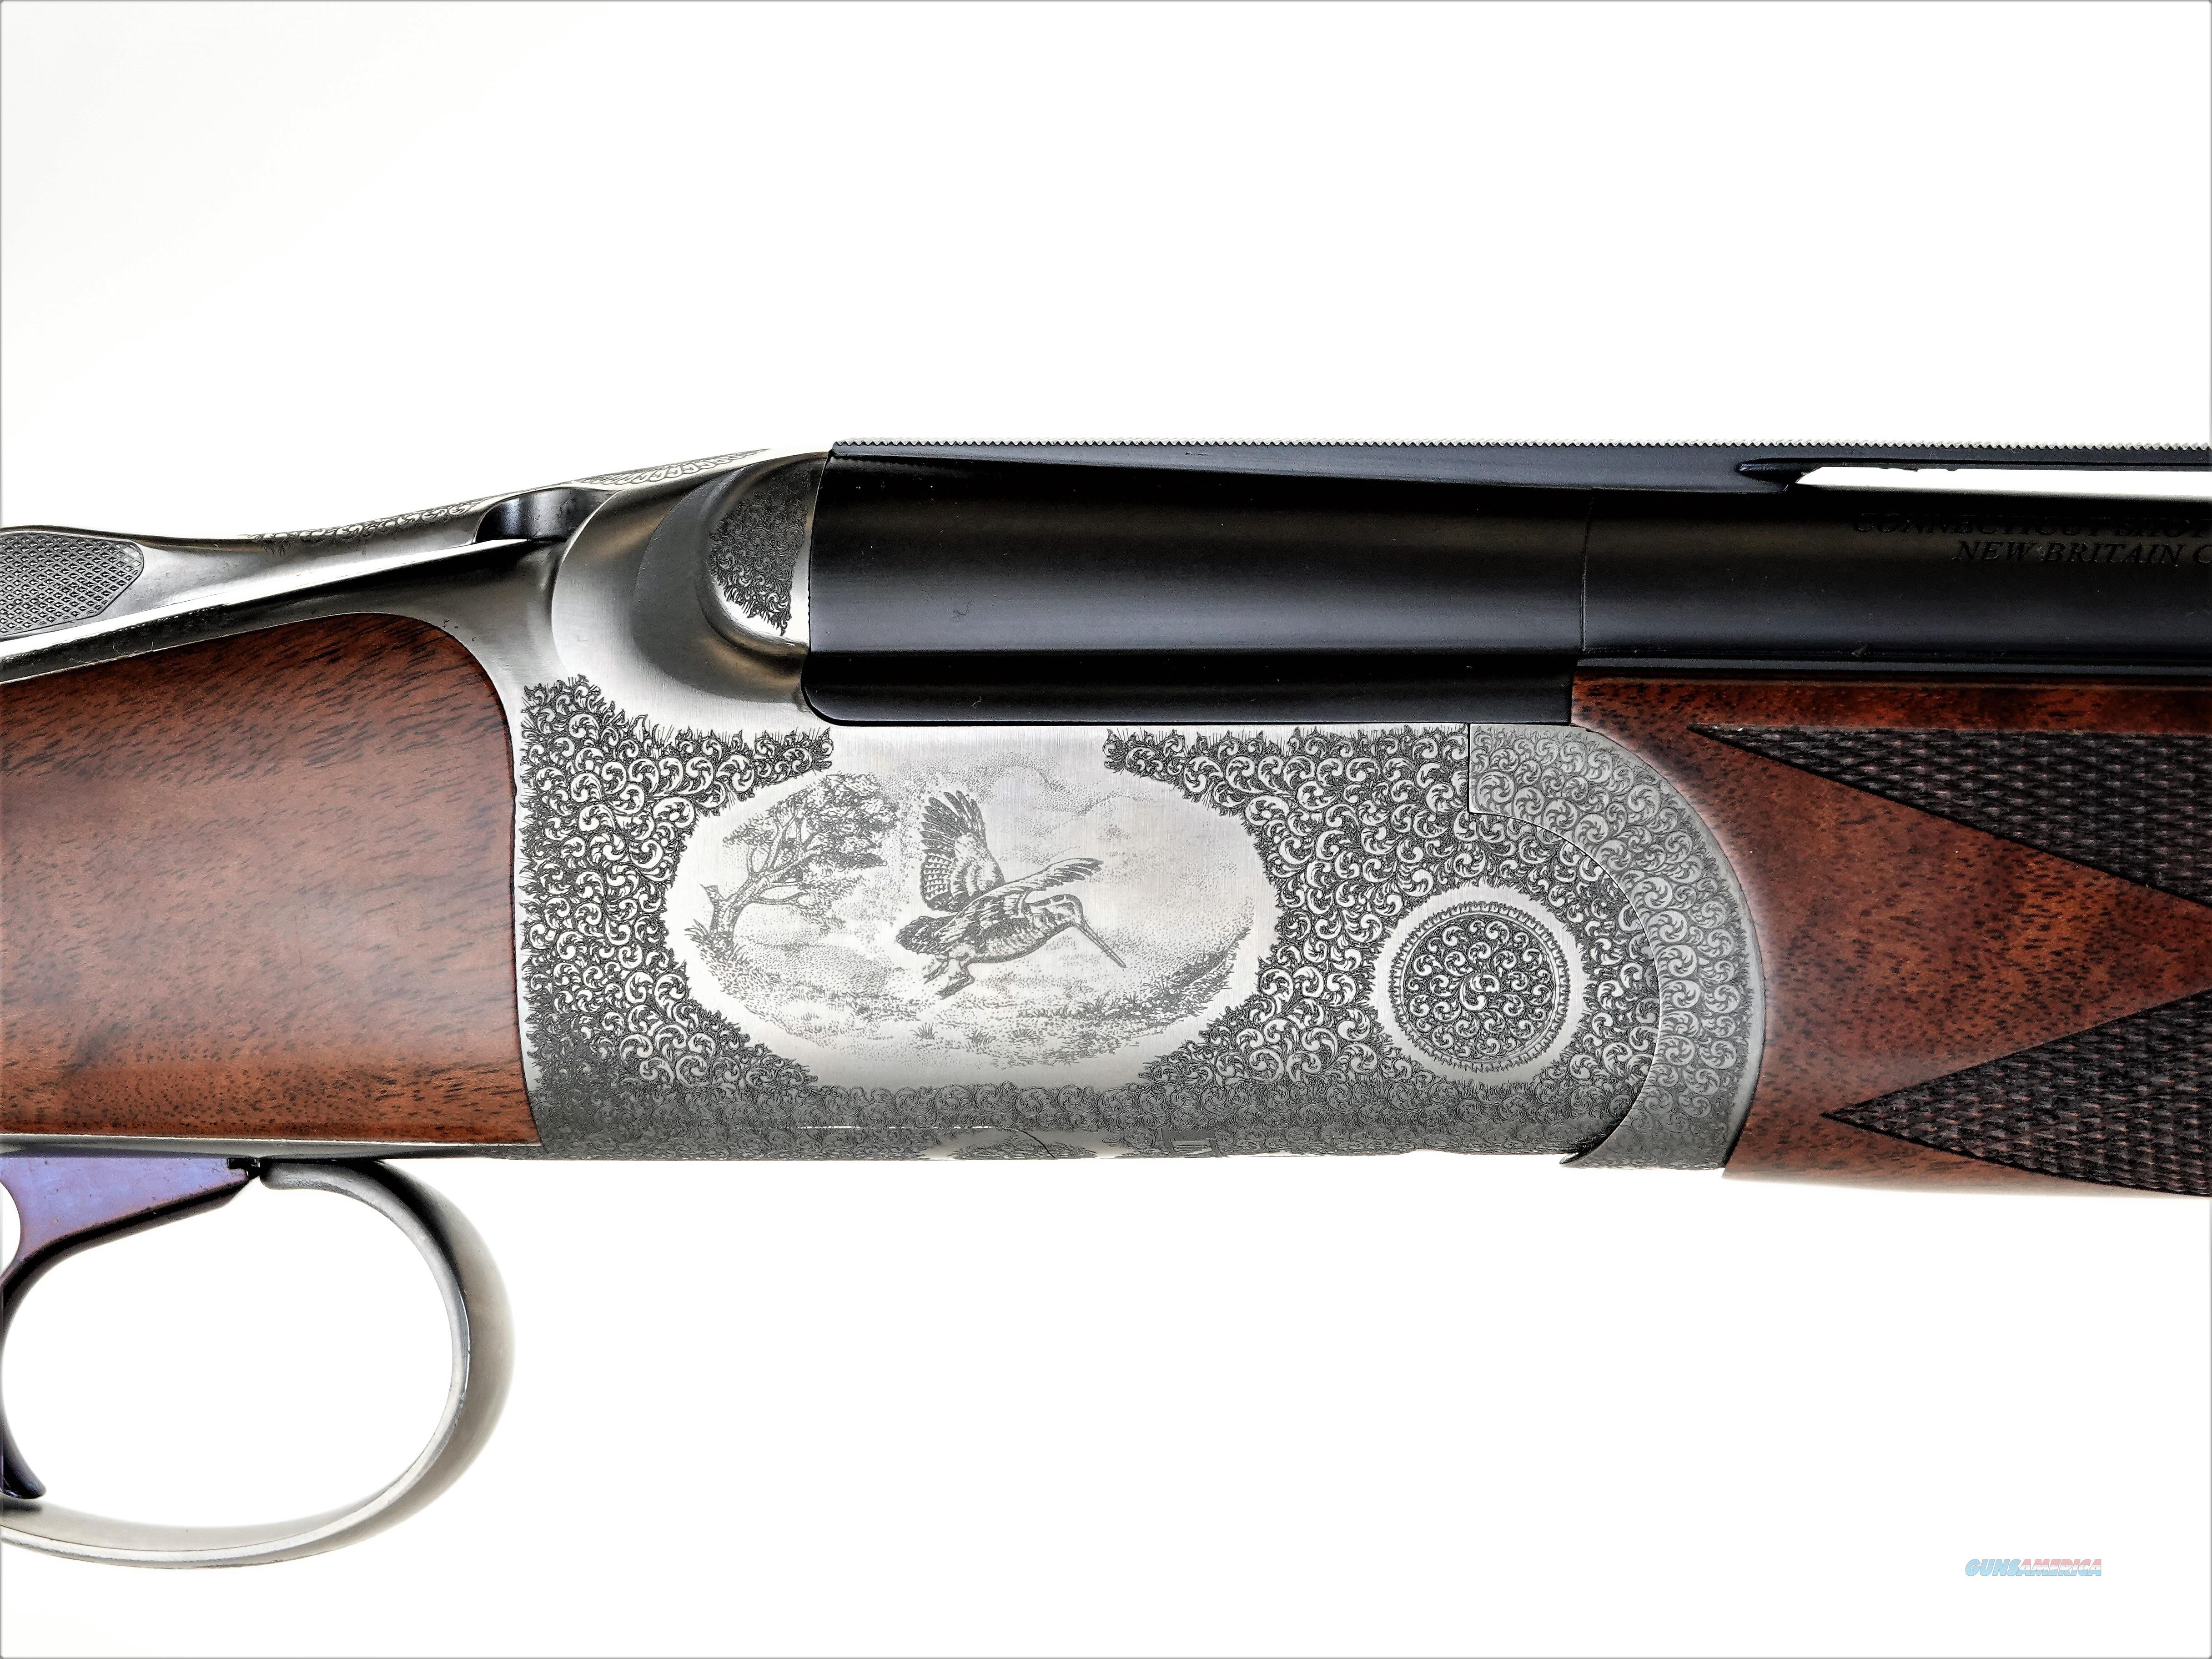 "CSMC Inverness - Special, Round Body, 20ga. 28"" Barrels #32074  Guns > Shotguns > Connecticut (Galazan) Shotguns"